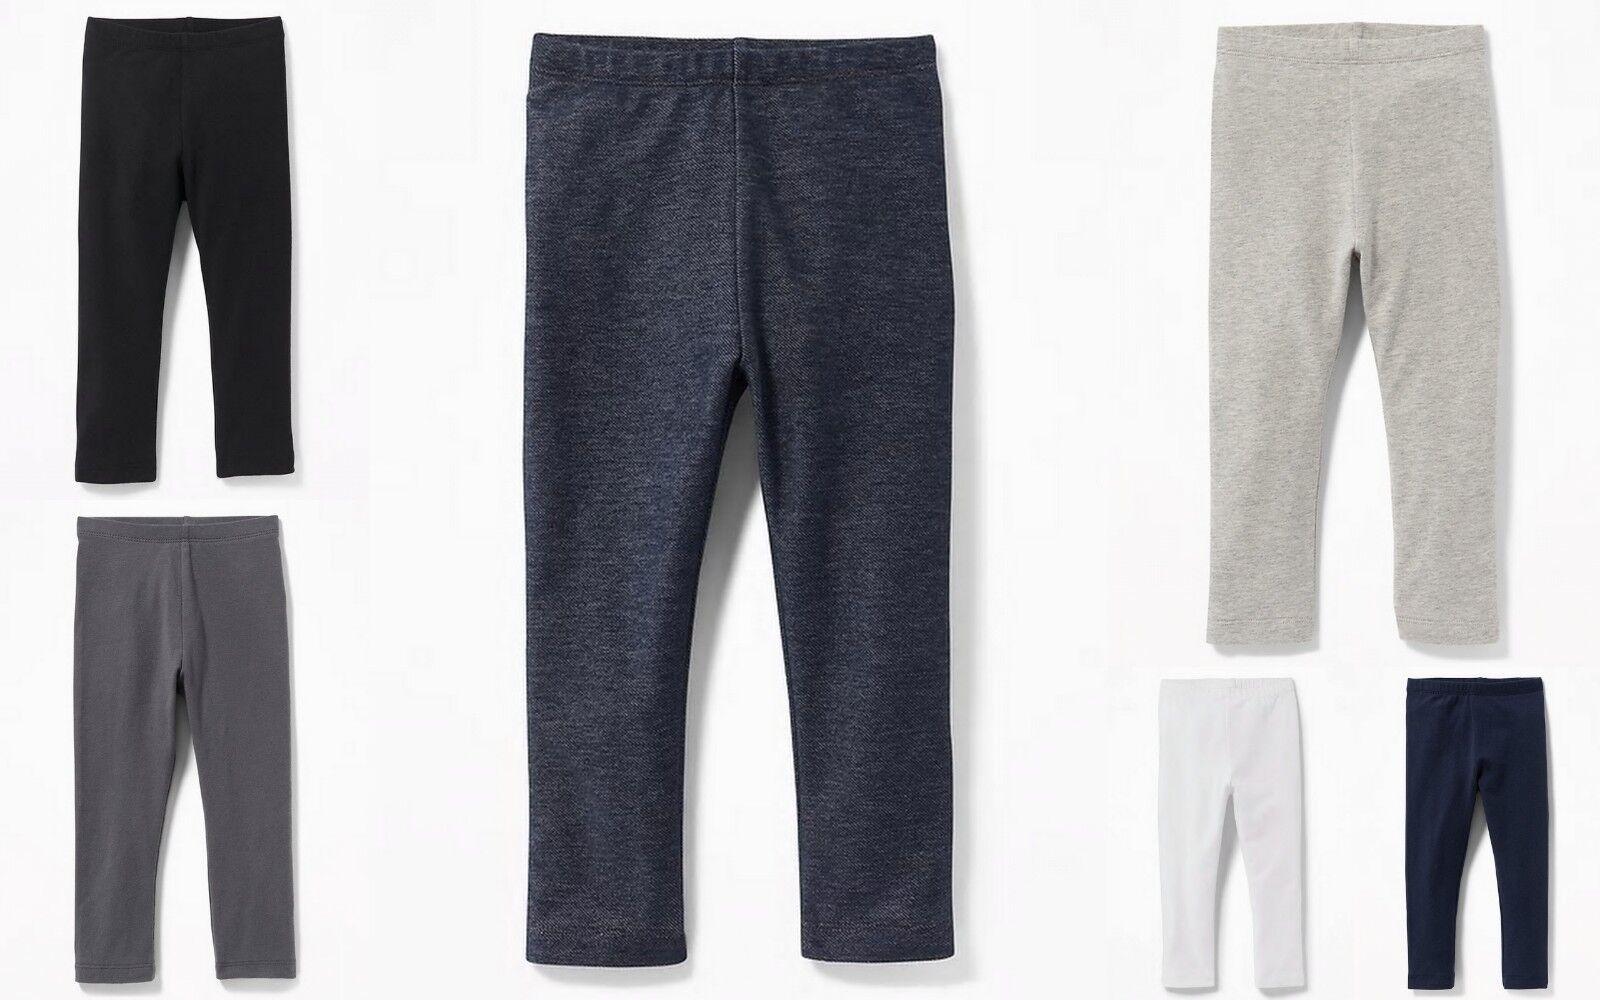 NWT Old Navy Toddler Girls Full Length Jersey Leggings Pants U-PICK 3T 4T 5T